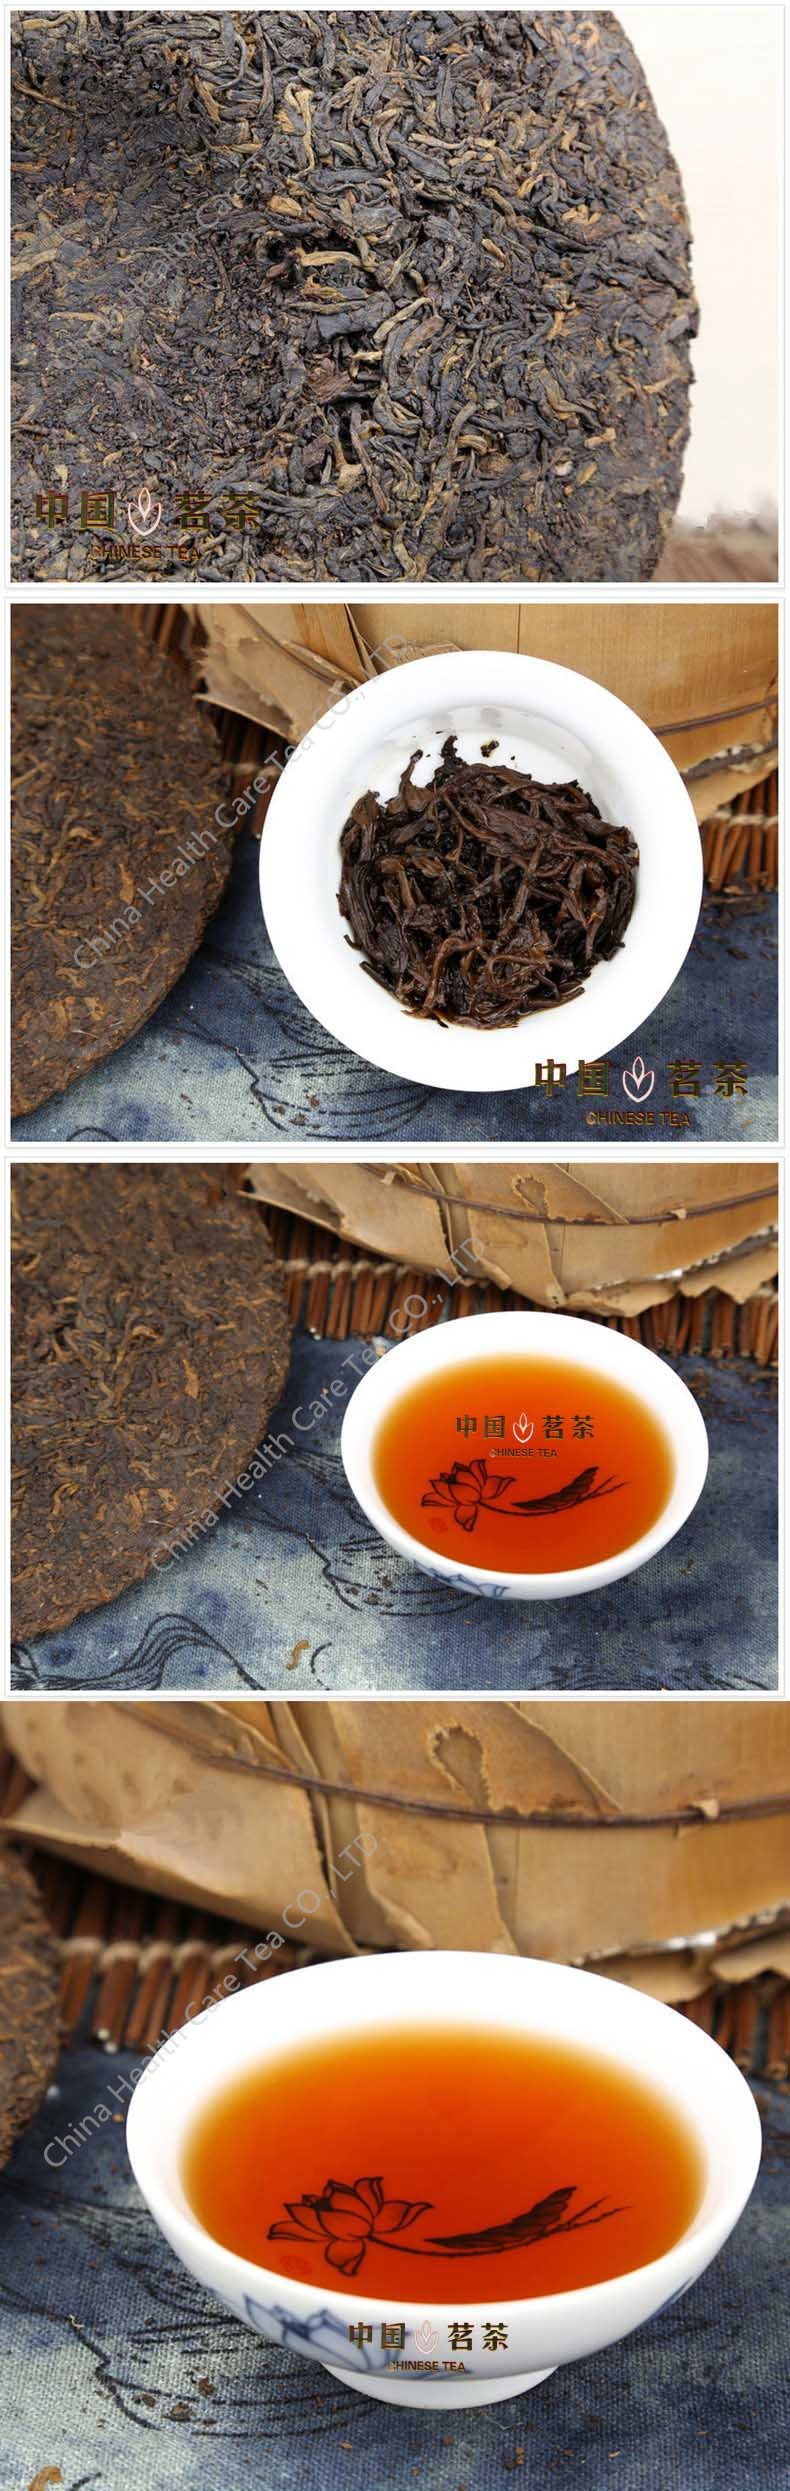 Made in 1960 Raw Pu Er Tea, 357g Oldest Puer Tea, Ansestor Antique, Honey Sweet, Dull-red Puerh tea, Ancient Tree